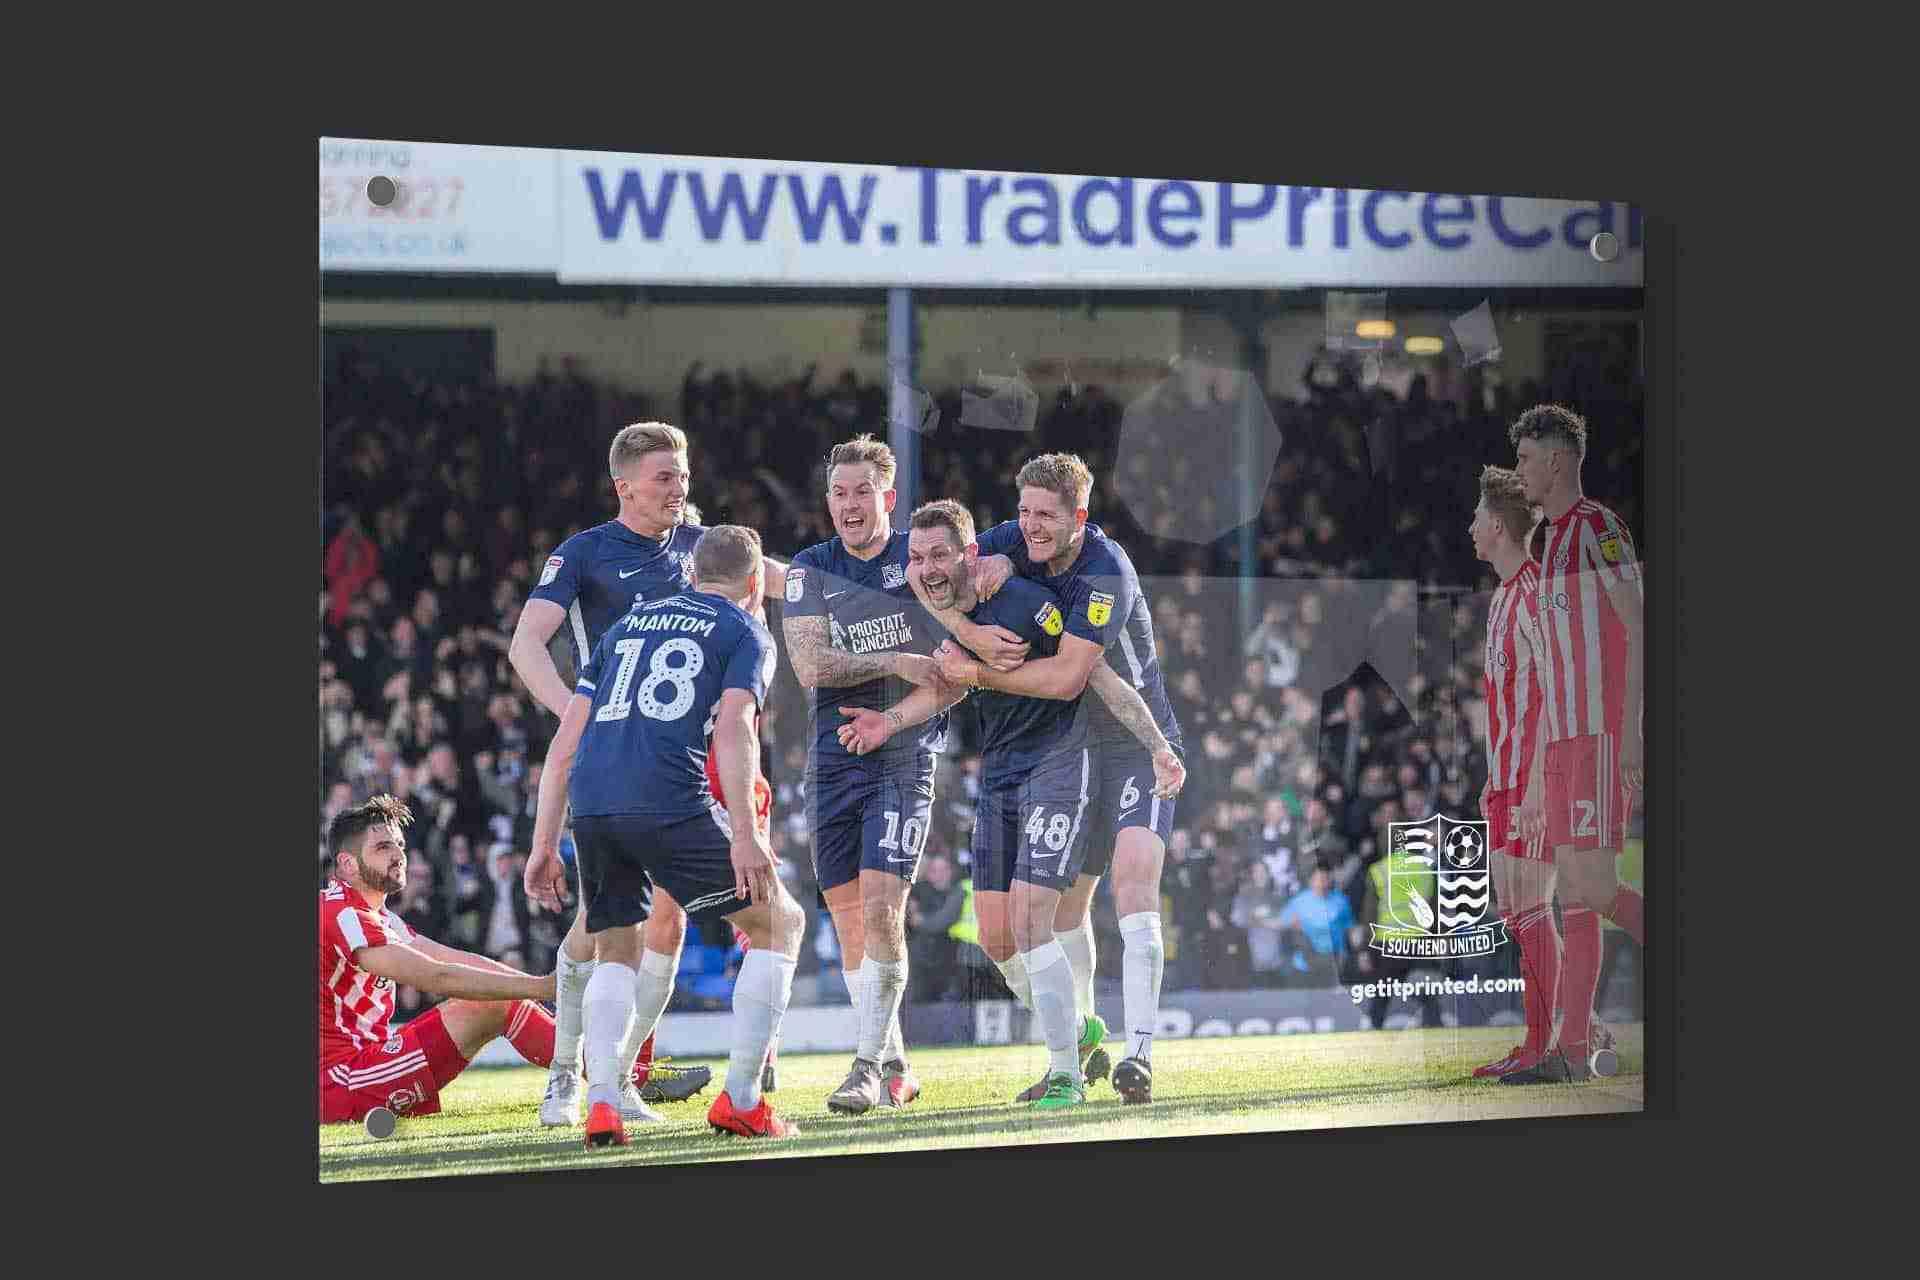 SUFC-Perspex-Studio-Sunderland-Game-1-1.jpg